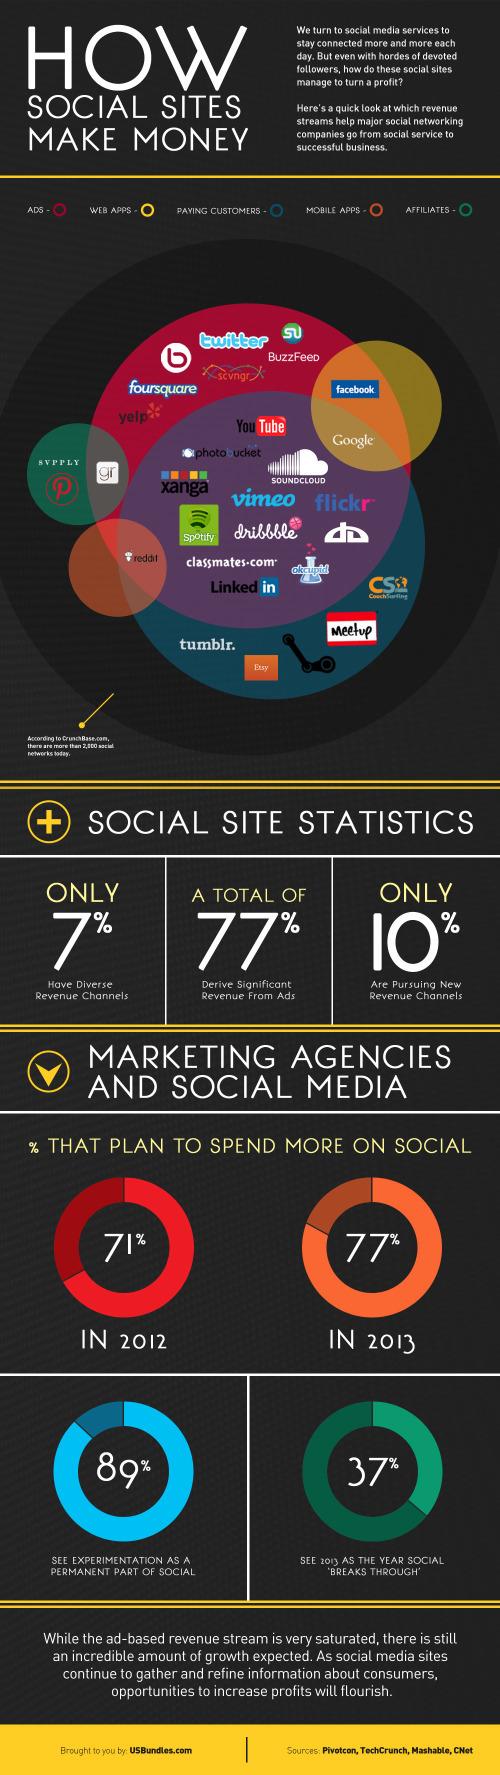 How Social Sites Make Money infographic